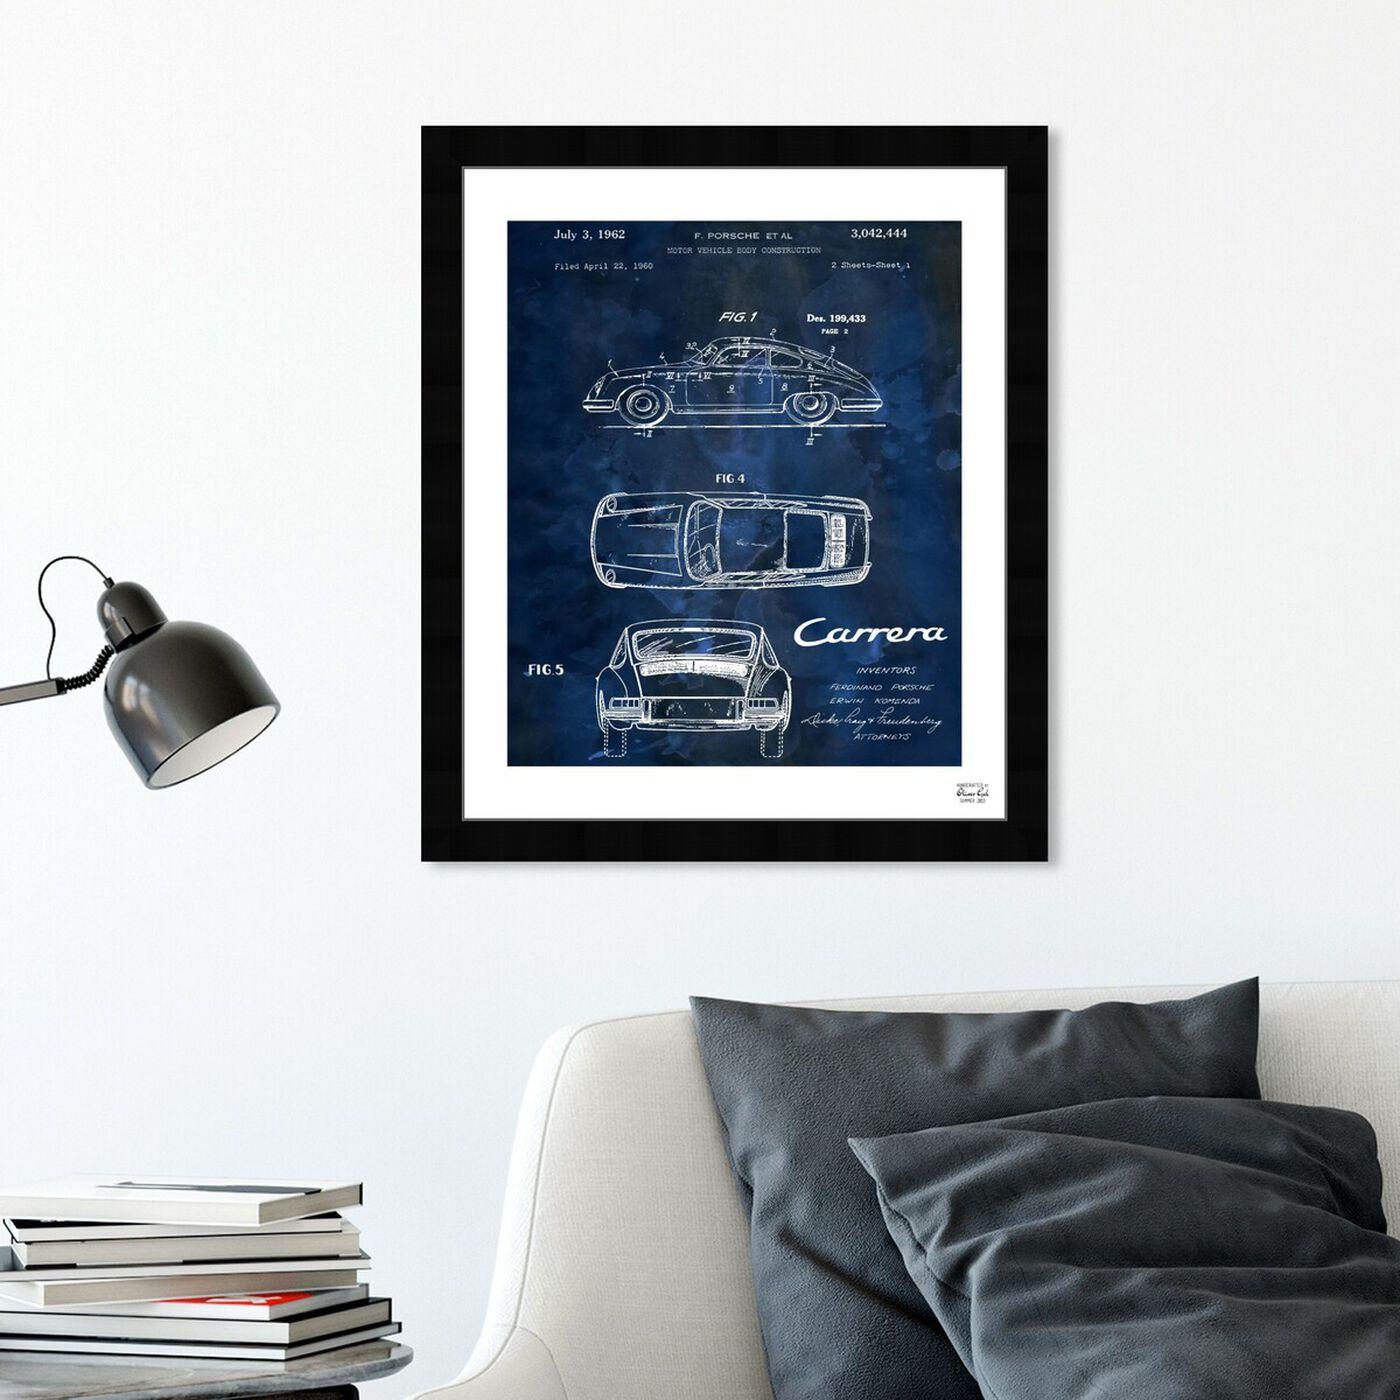 Hanging view of Carrera Porsche 1962 - Bleu featuring transportation and automobiles art.